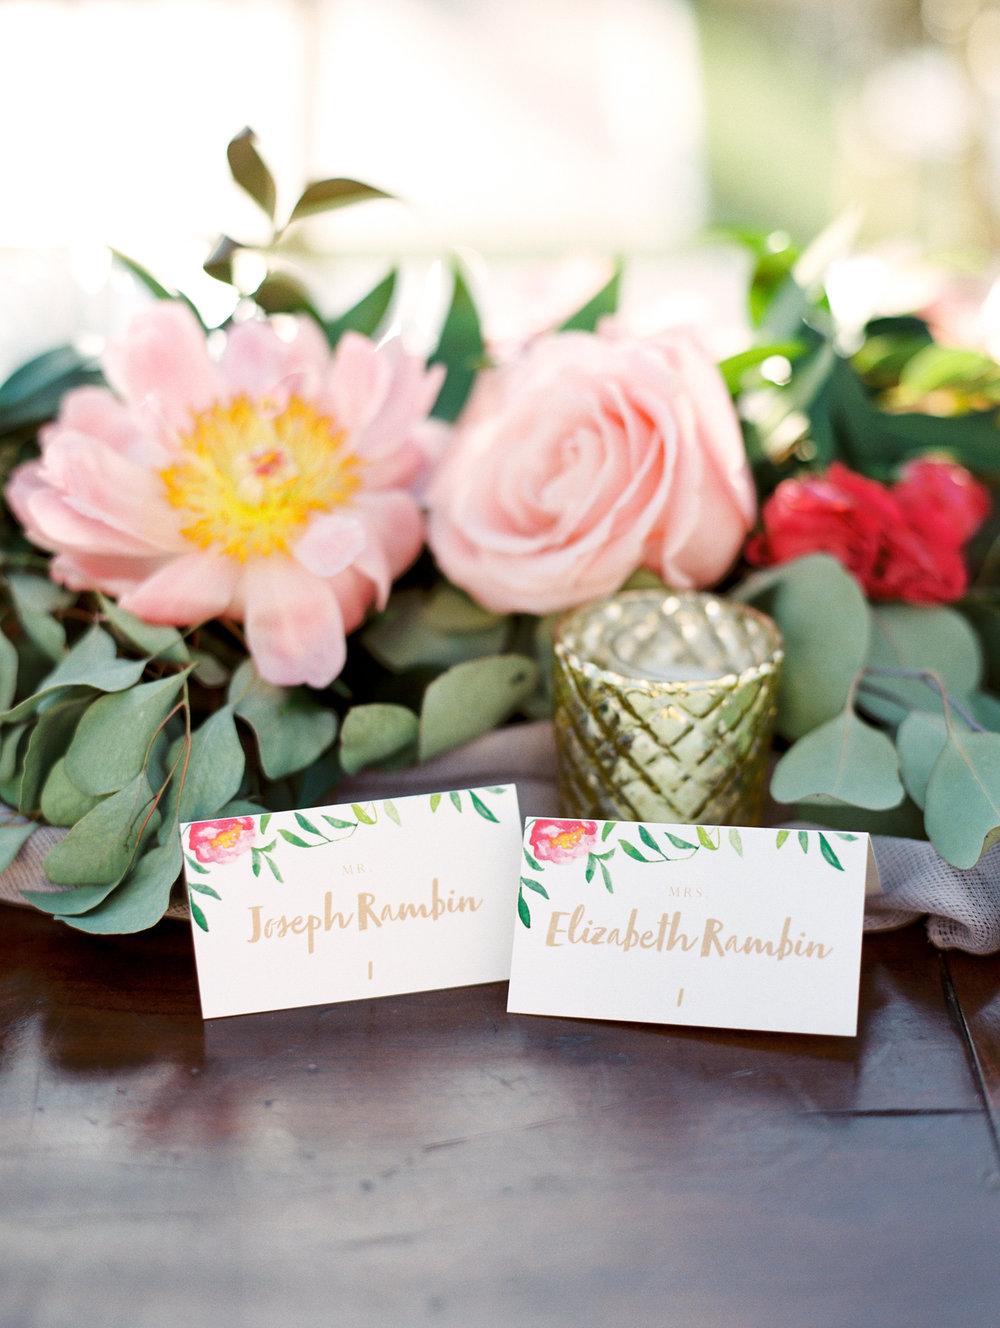 Escondido-Golf_Lake-Club-Hill-Country-Houston-Wedding-Photographer-Best-Top-Luxury-Destination-Engagements-Portrait-Austin-Photography-114.jpg